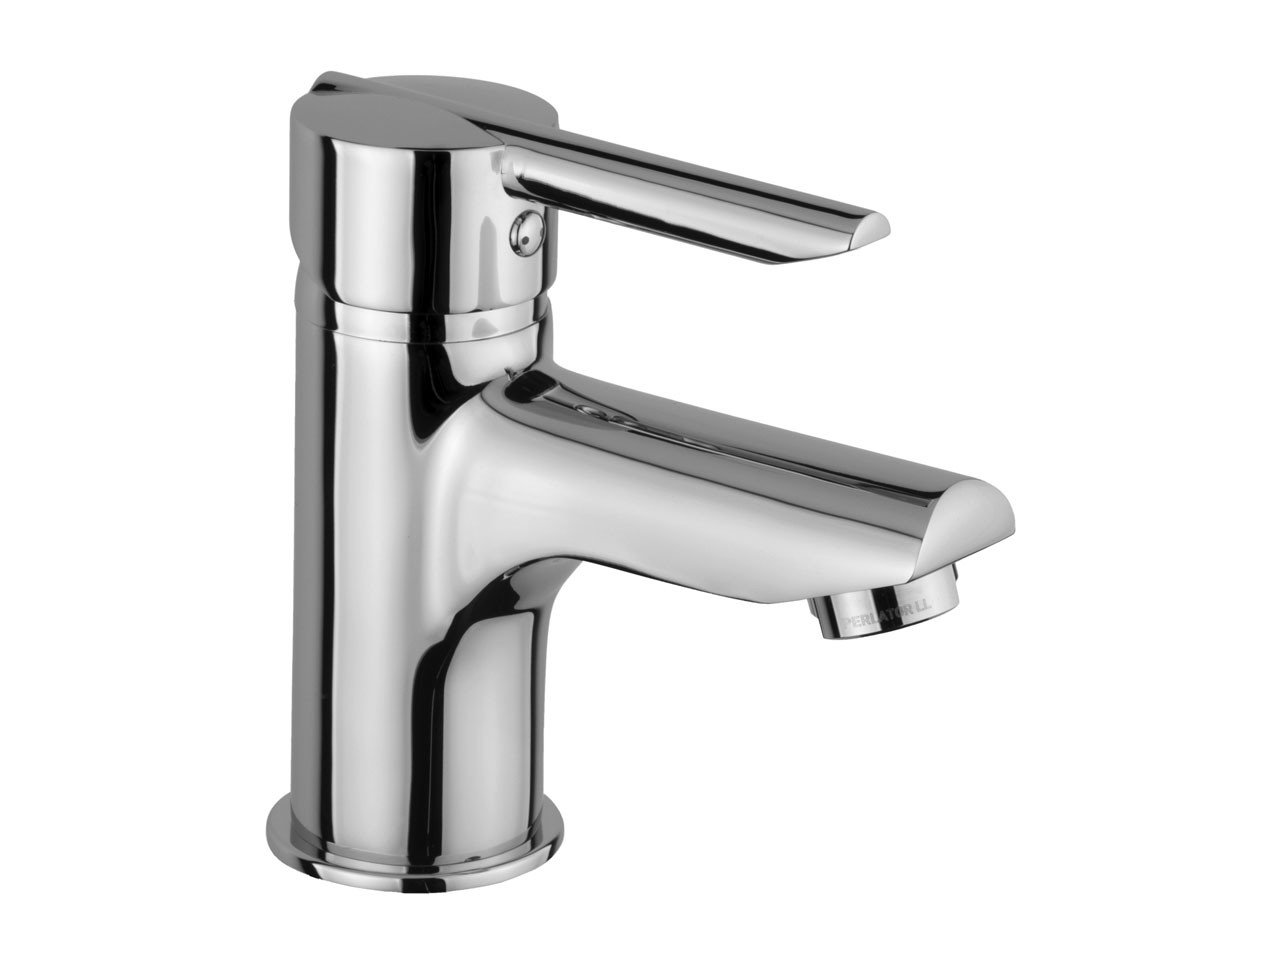 Edimburgo mix lavabo cromo iperceramica - Rubinetti lavabo bagno ...